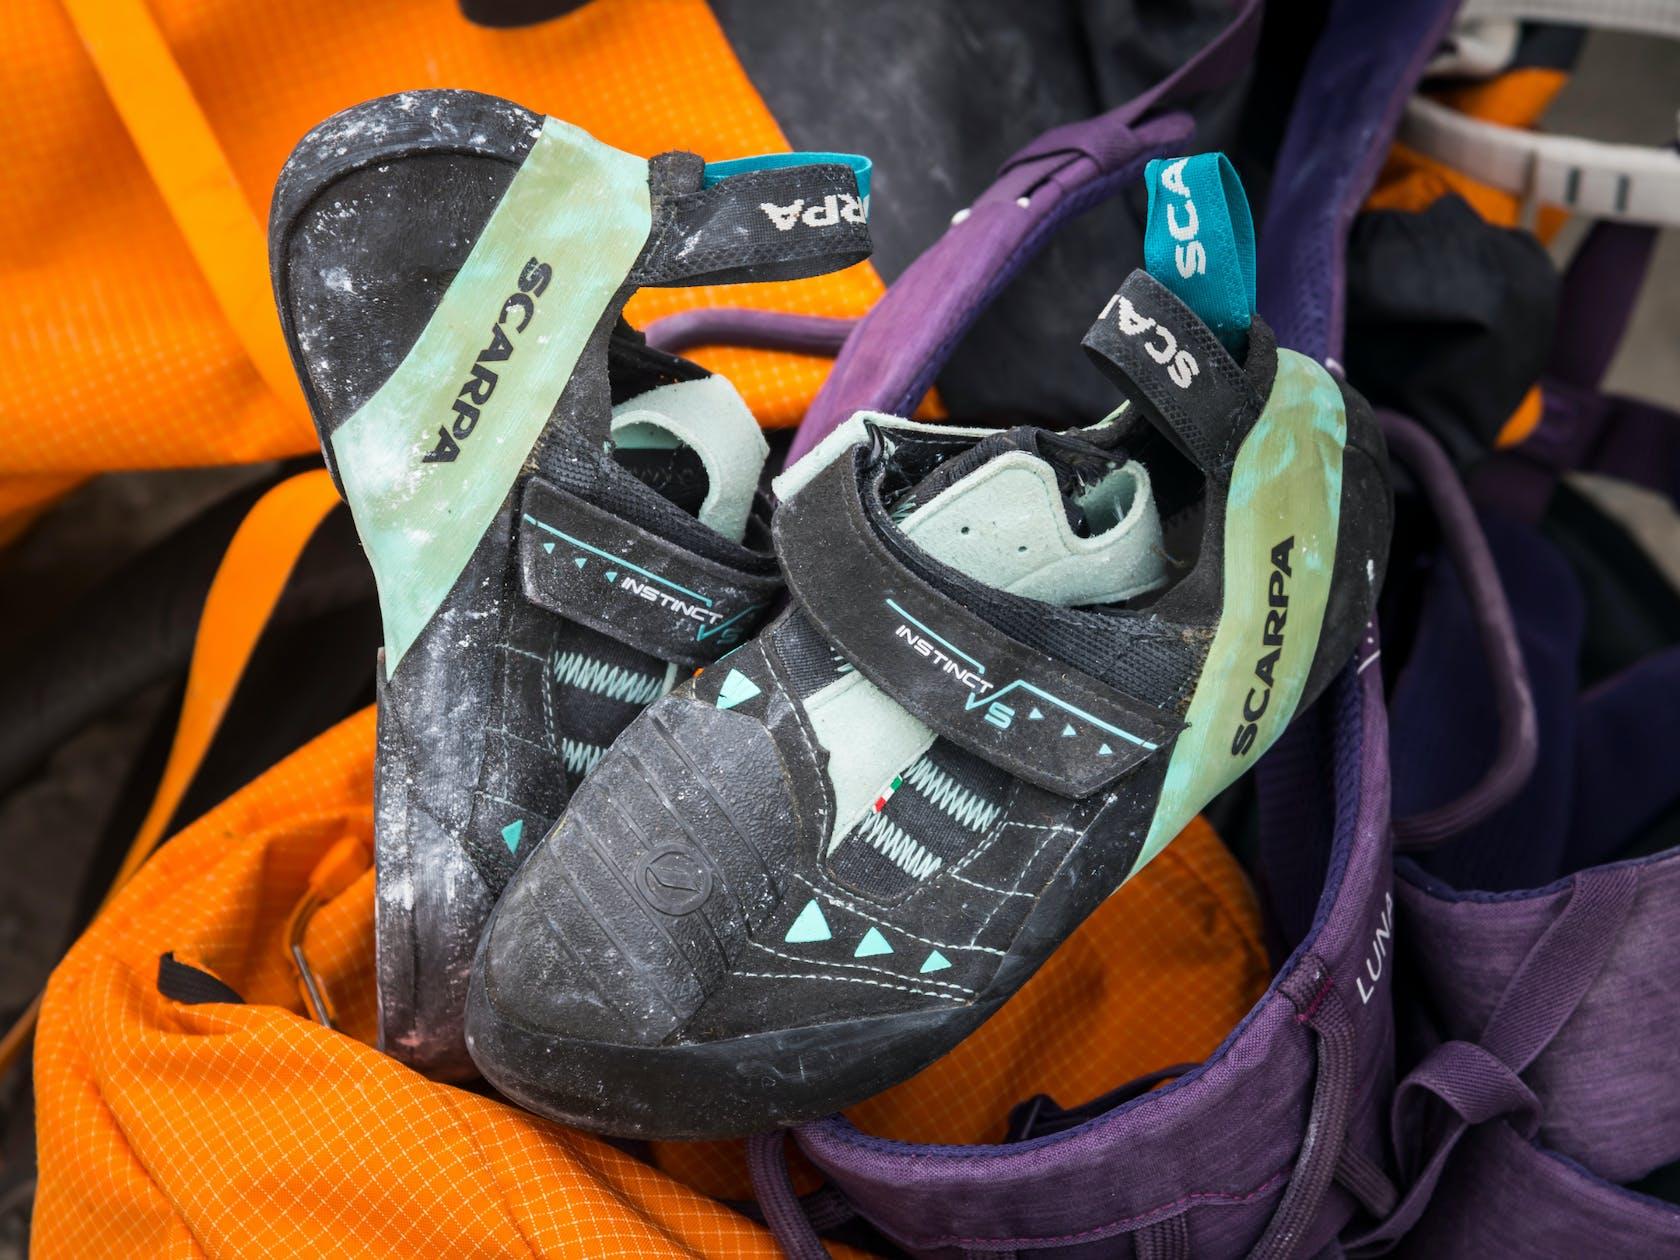 Scarpette da arrampicata Shop Online SPORTLER